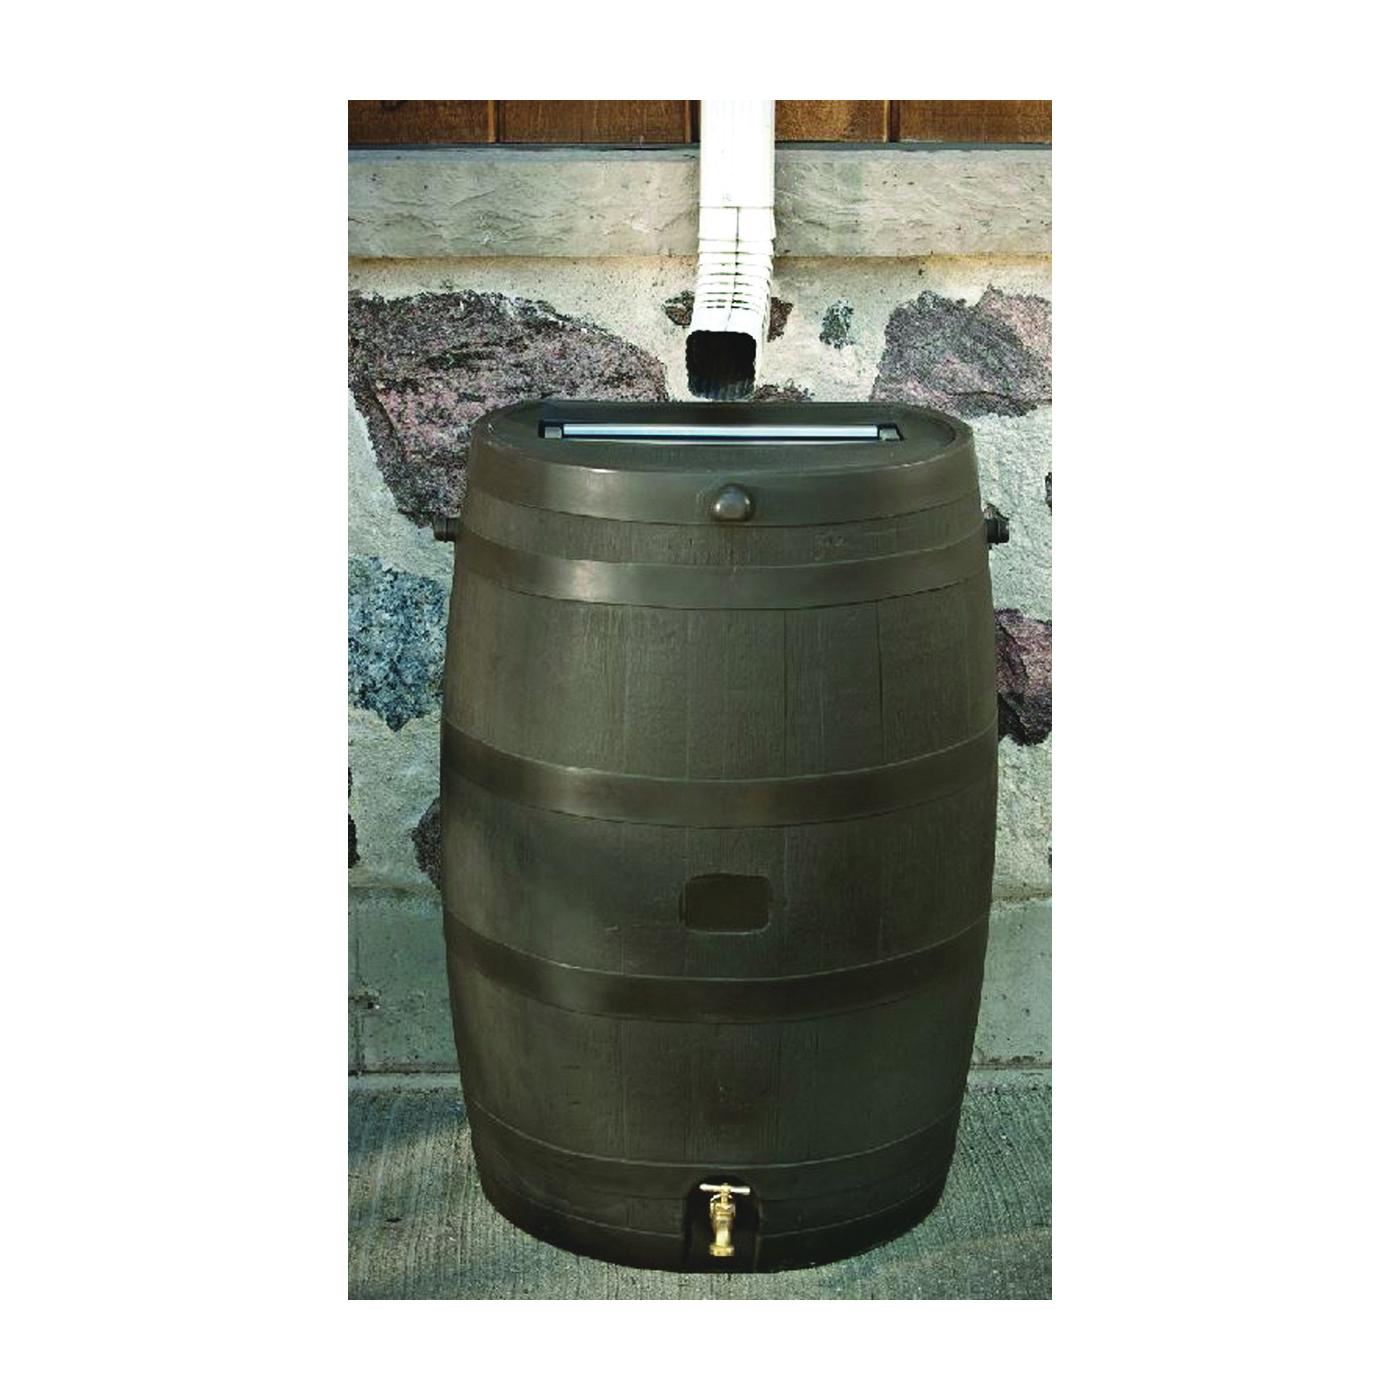 Picture of RTS 55100009005600 Rain Barrel, 50 gal Capacity, Wood, Brown